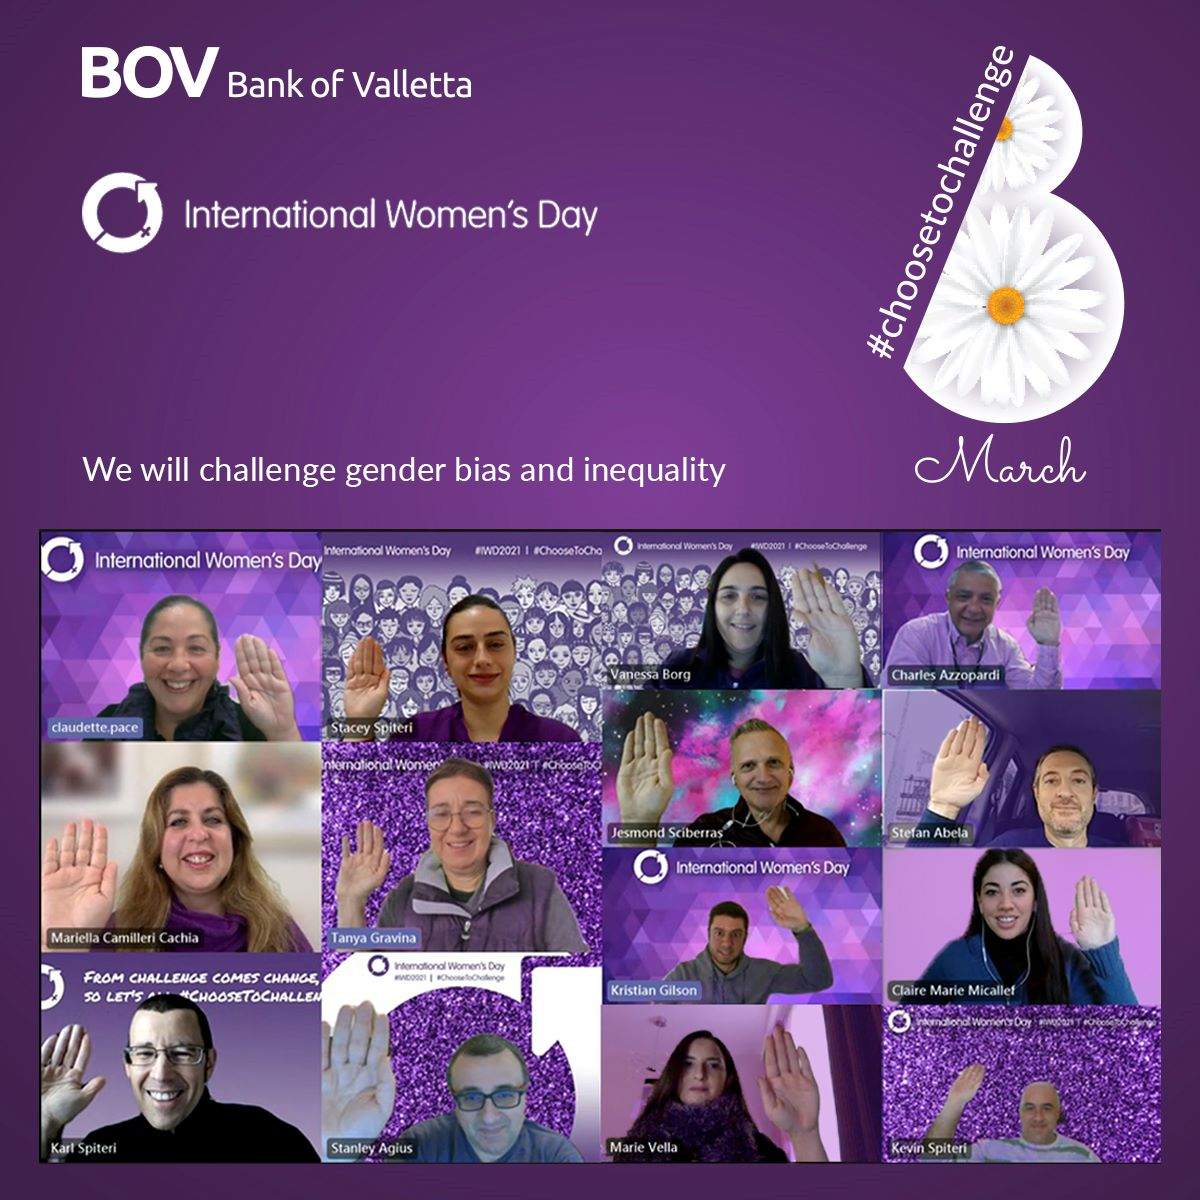 BOV staff challenge inequality and gender bias